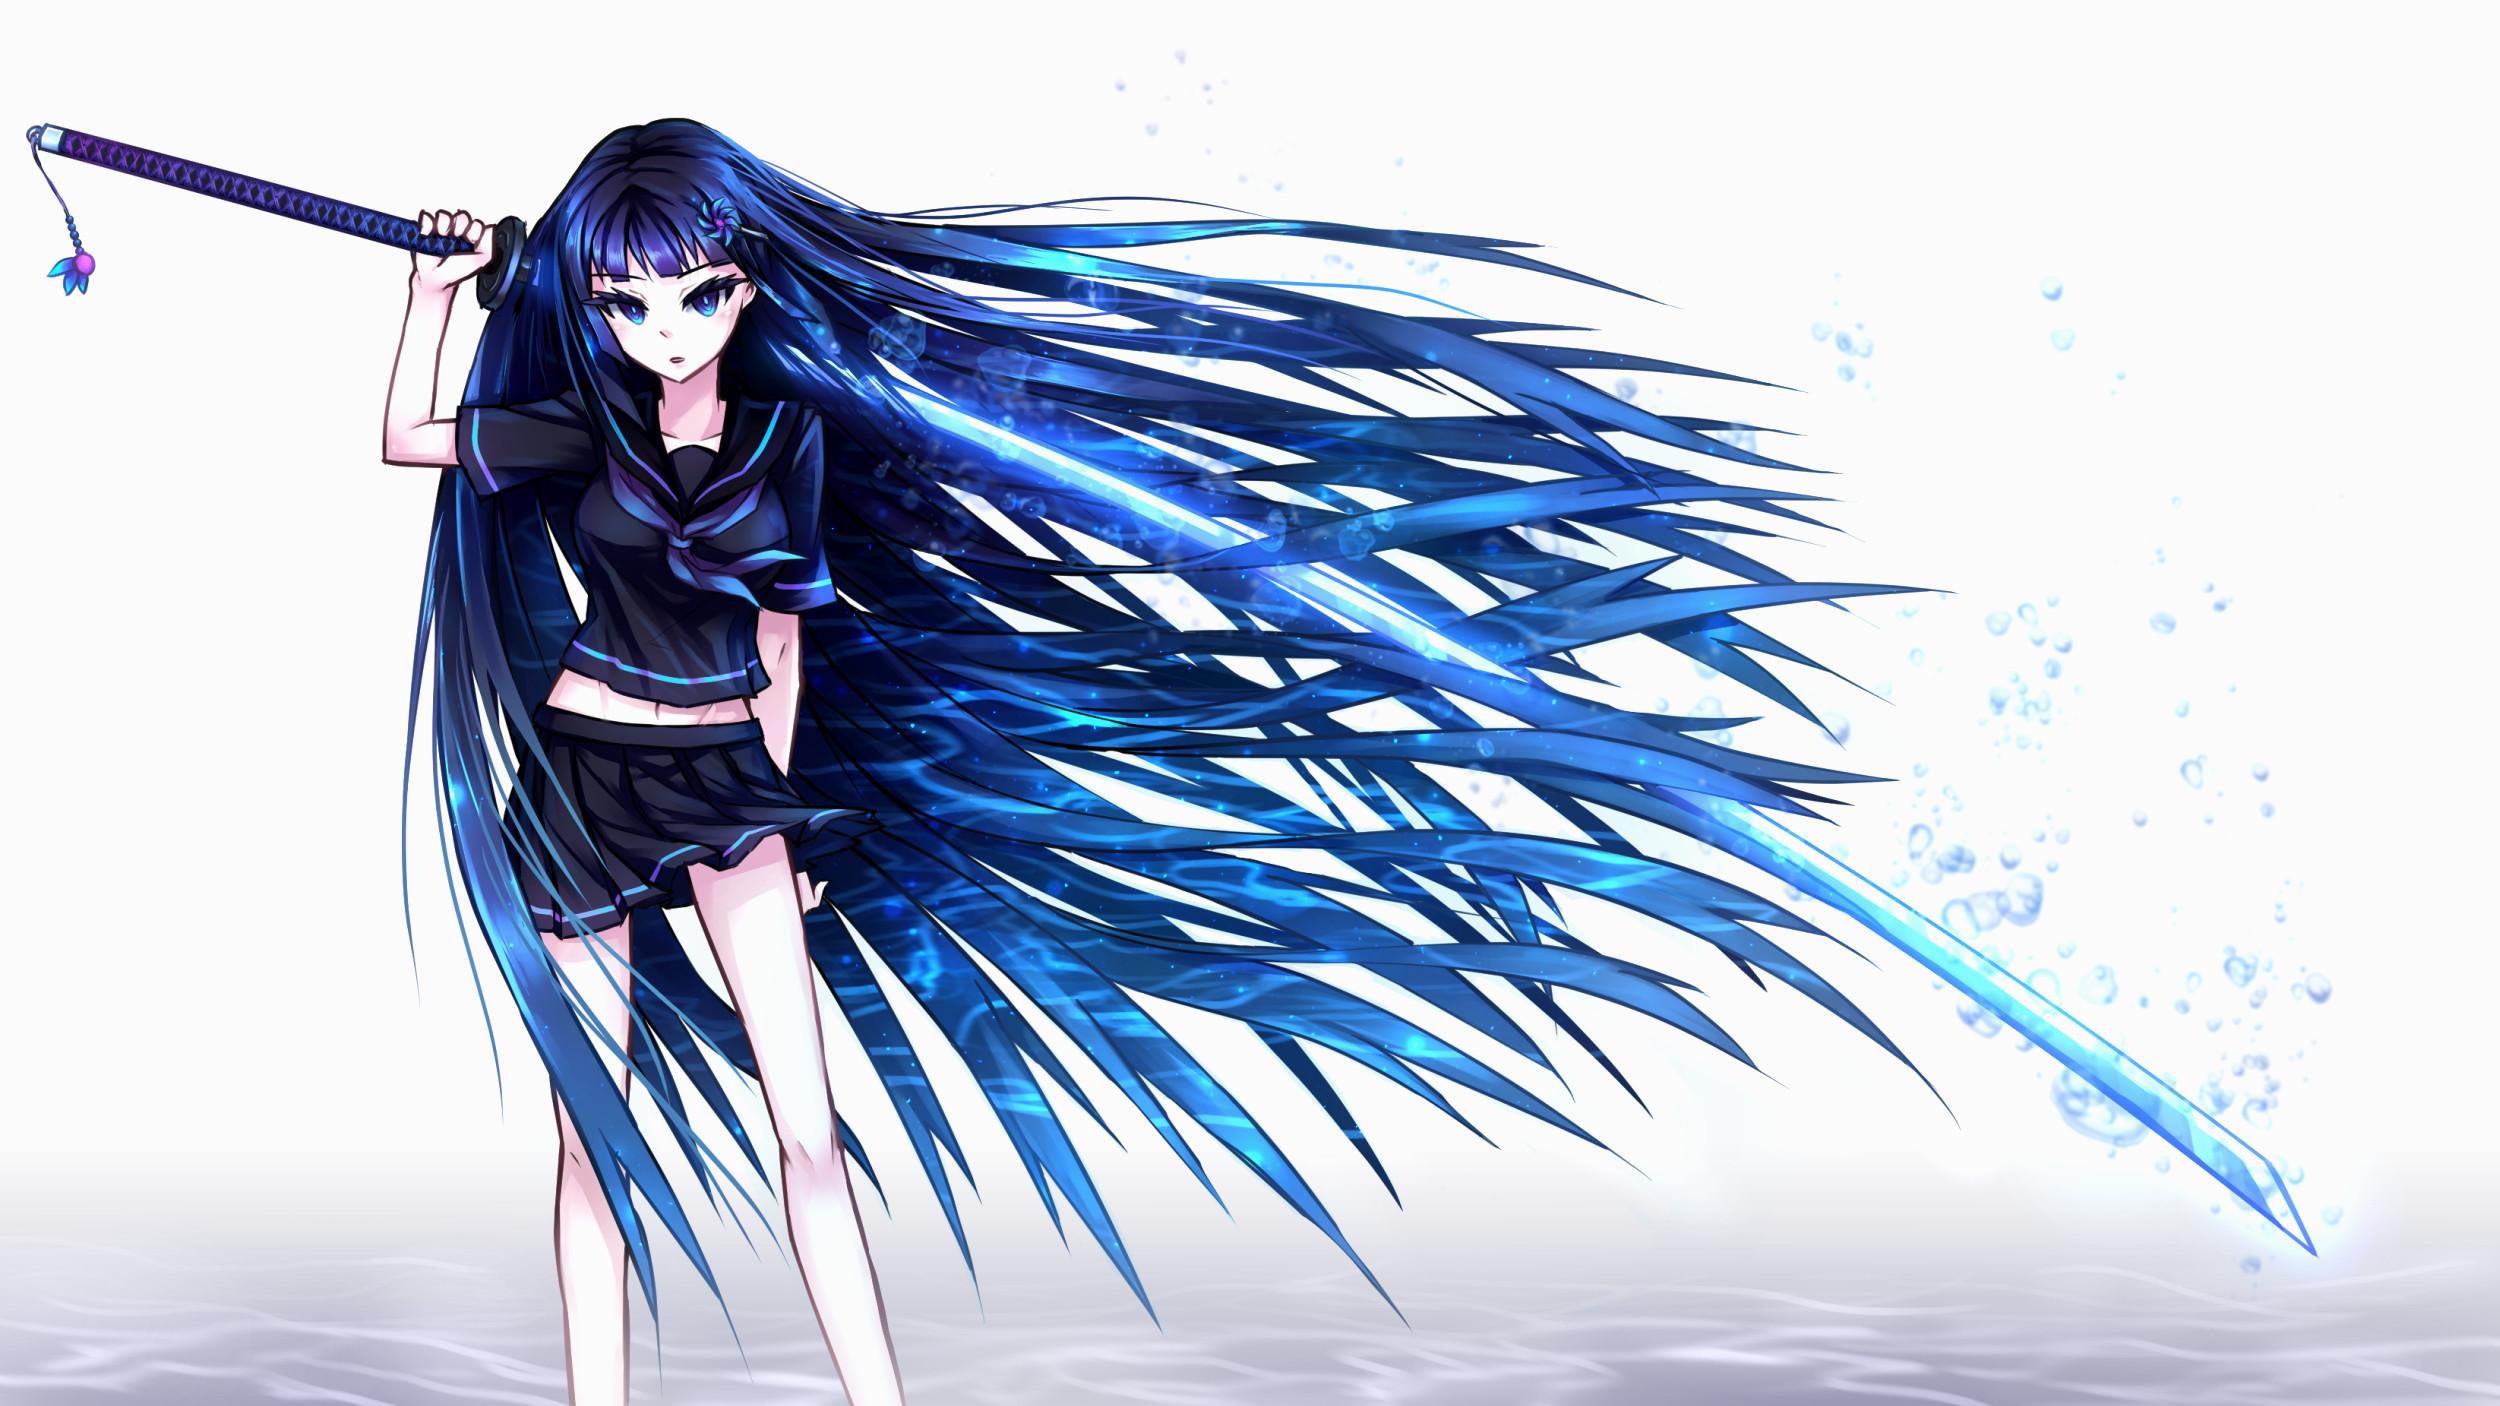 Anime Girl With Sword Wallpaper Hd - Sword Anime Girl Wallpaper Hd - HD Wallpaper